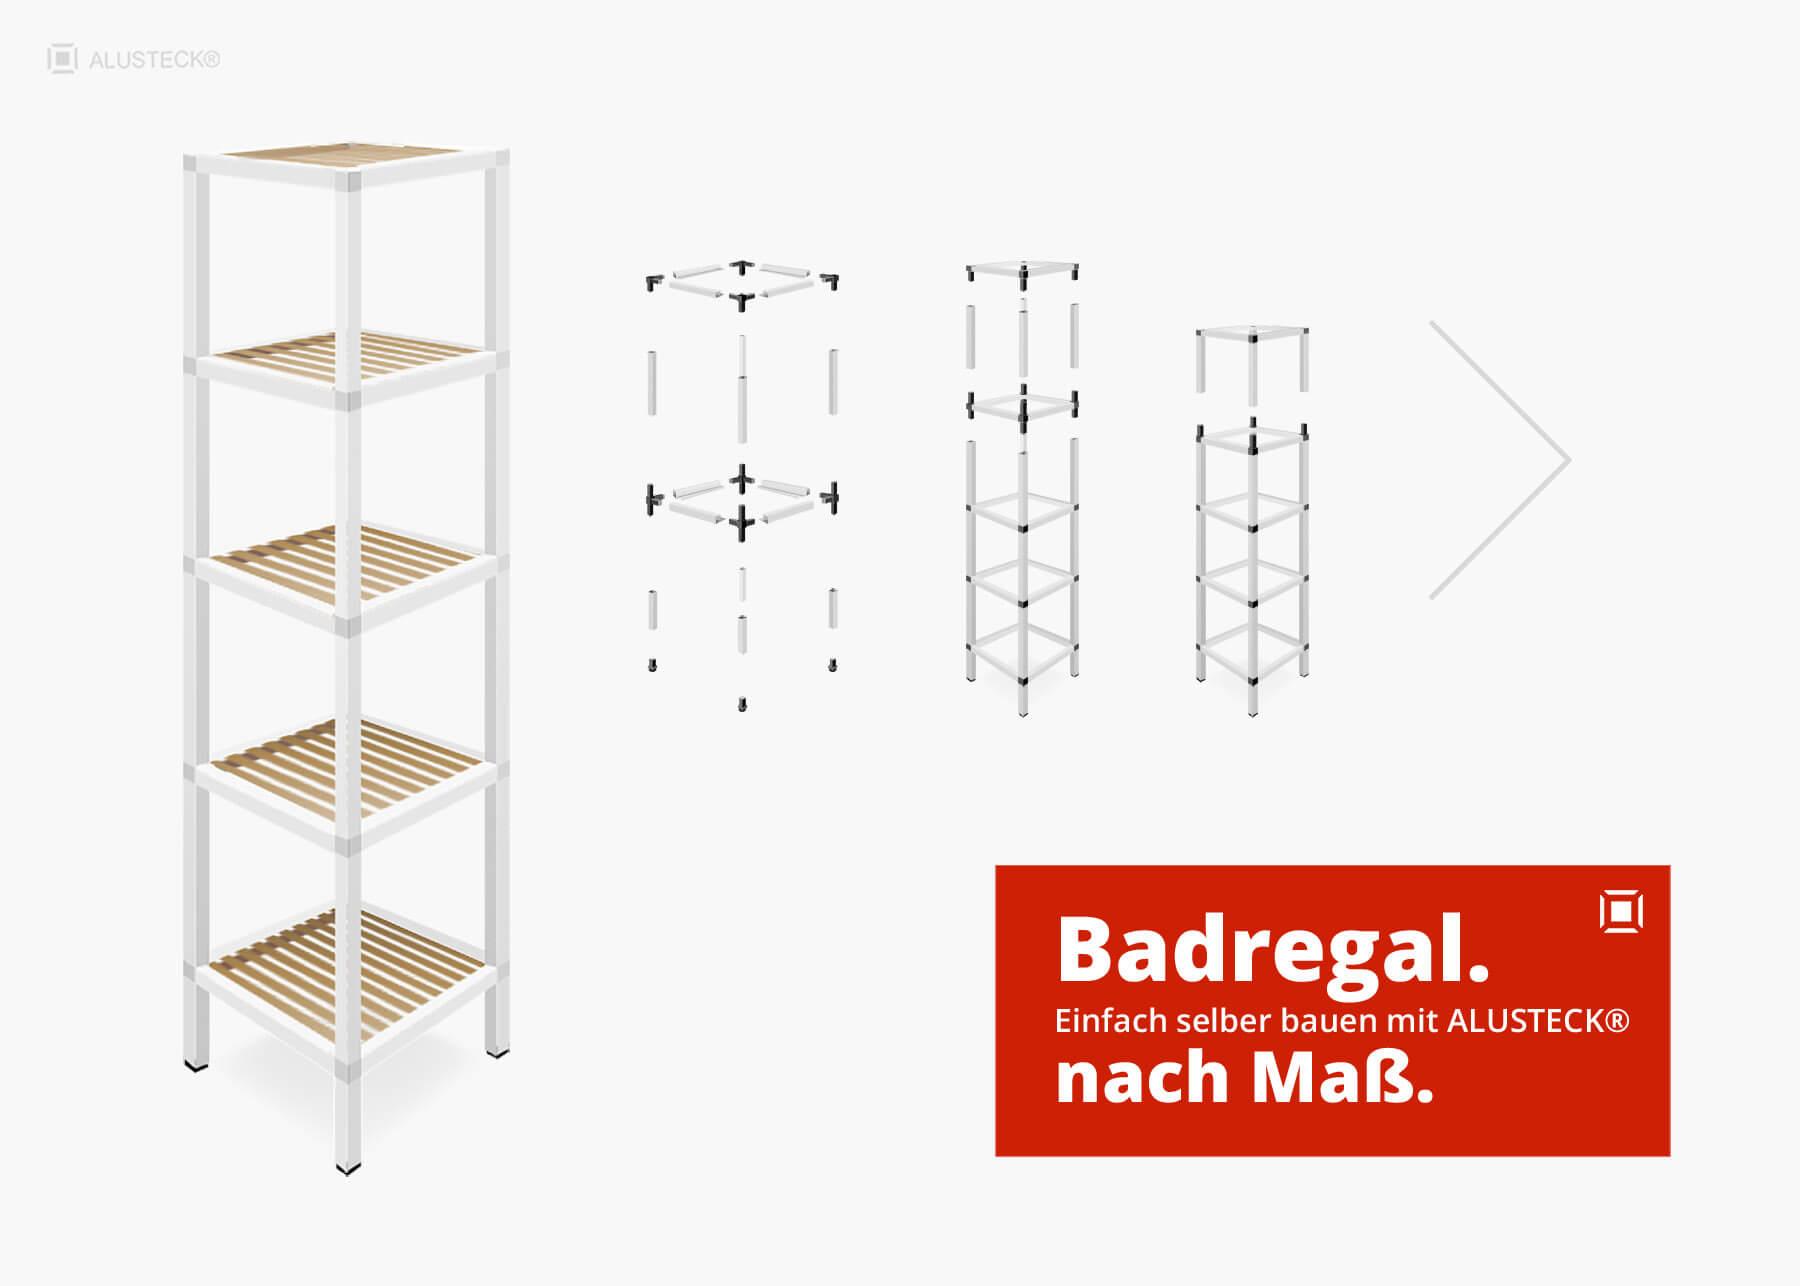 Badregal selber bauen - Anleitung Badezimmer-Regal